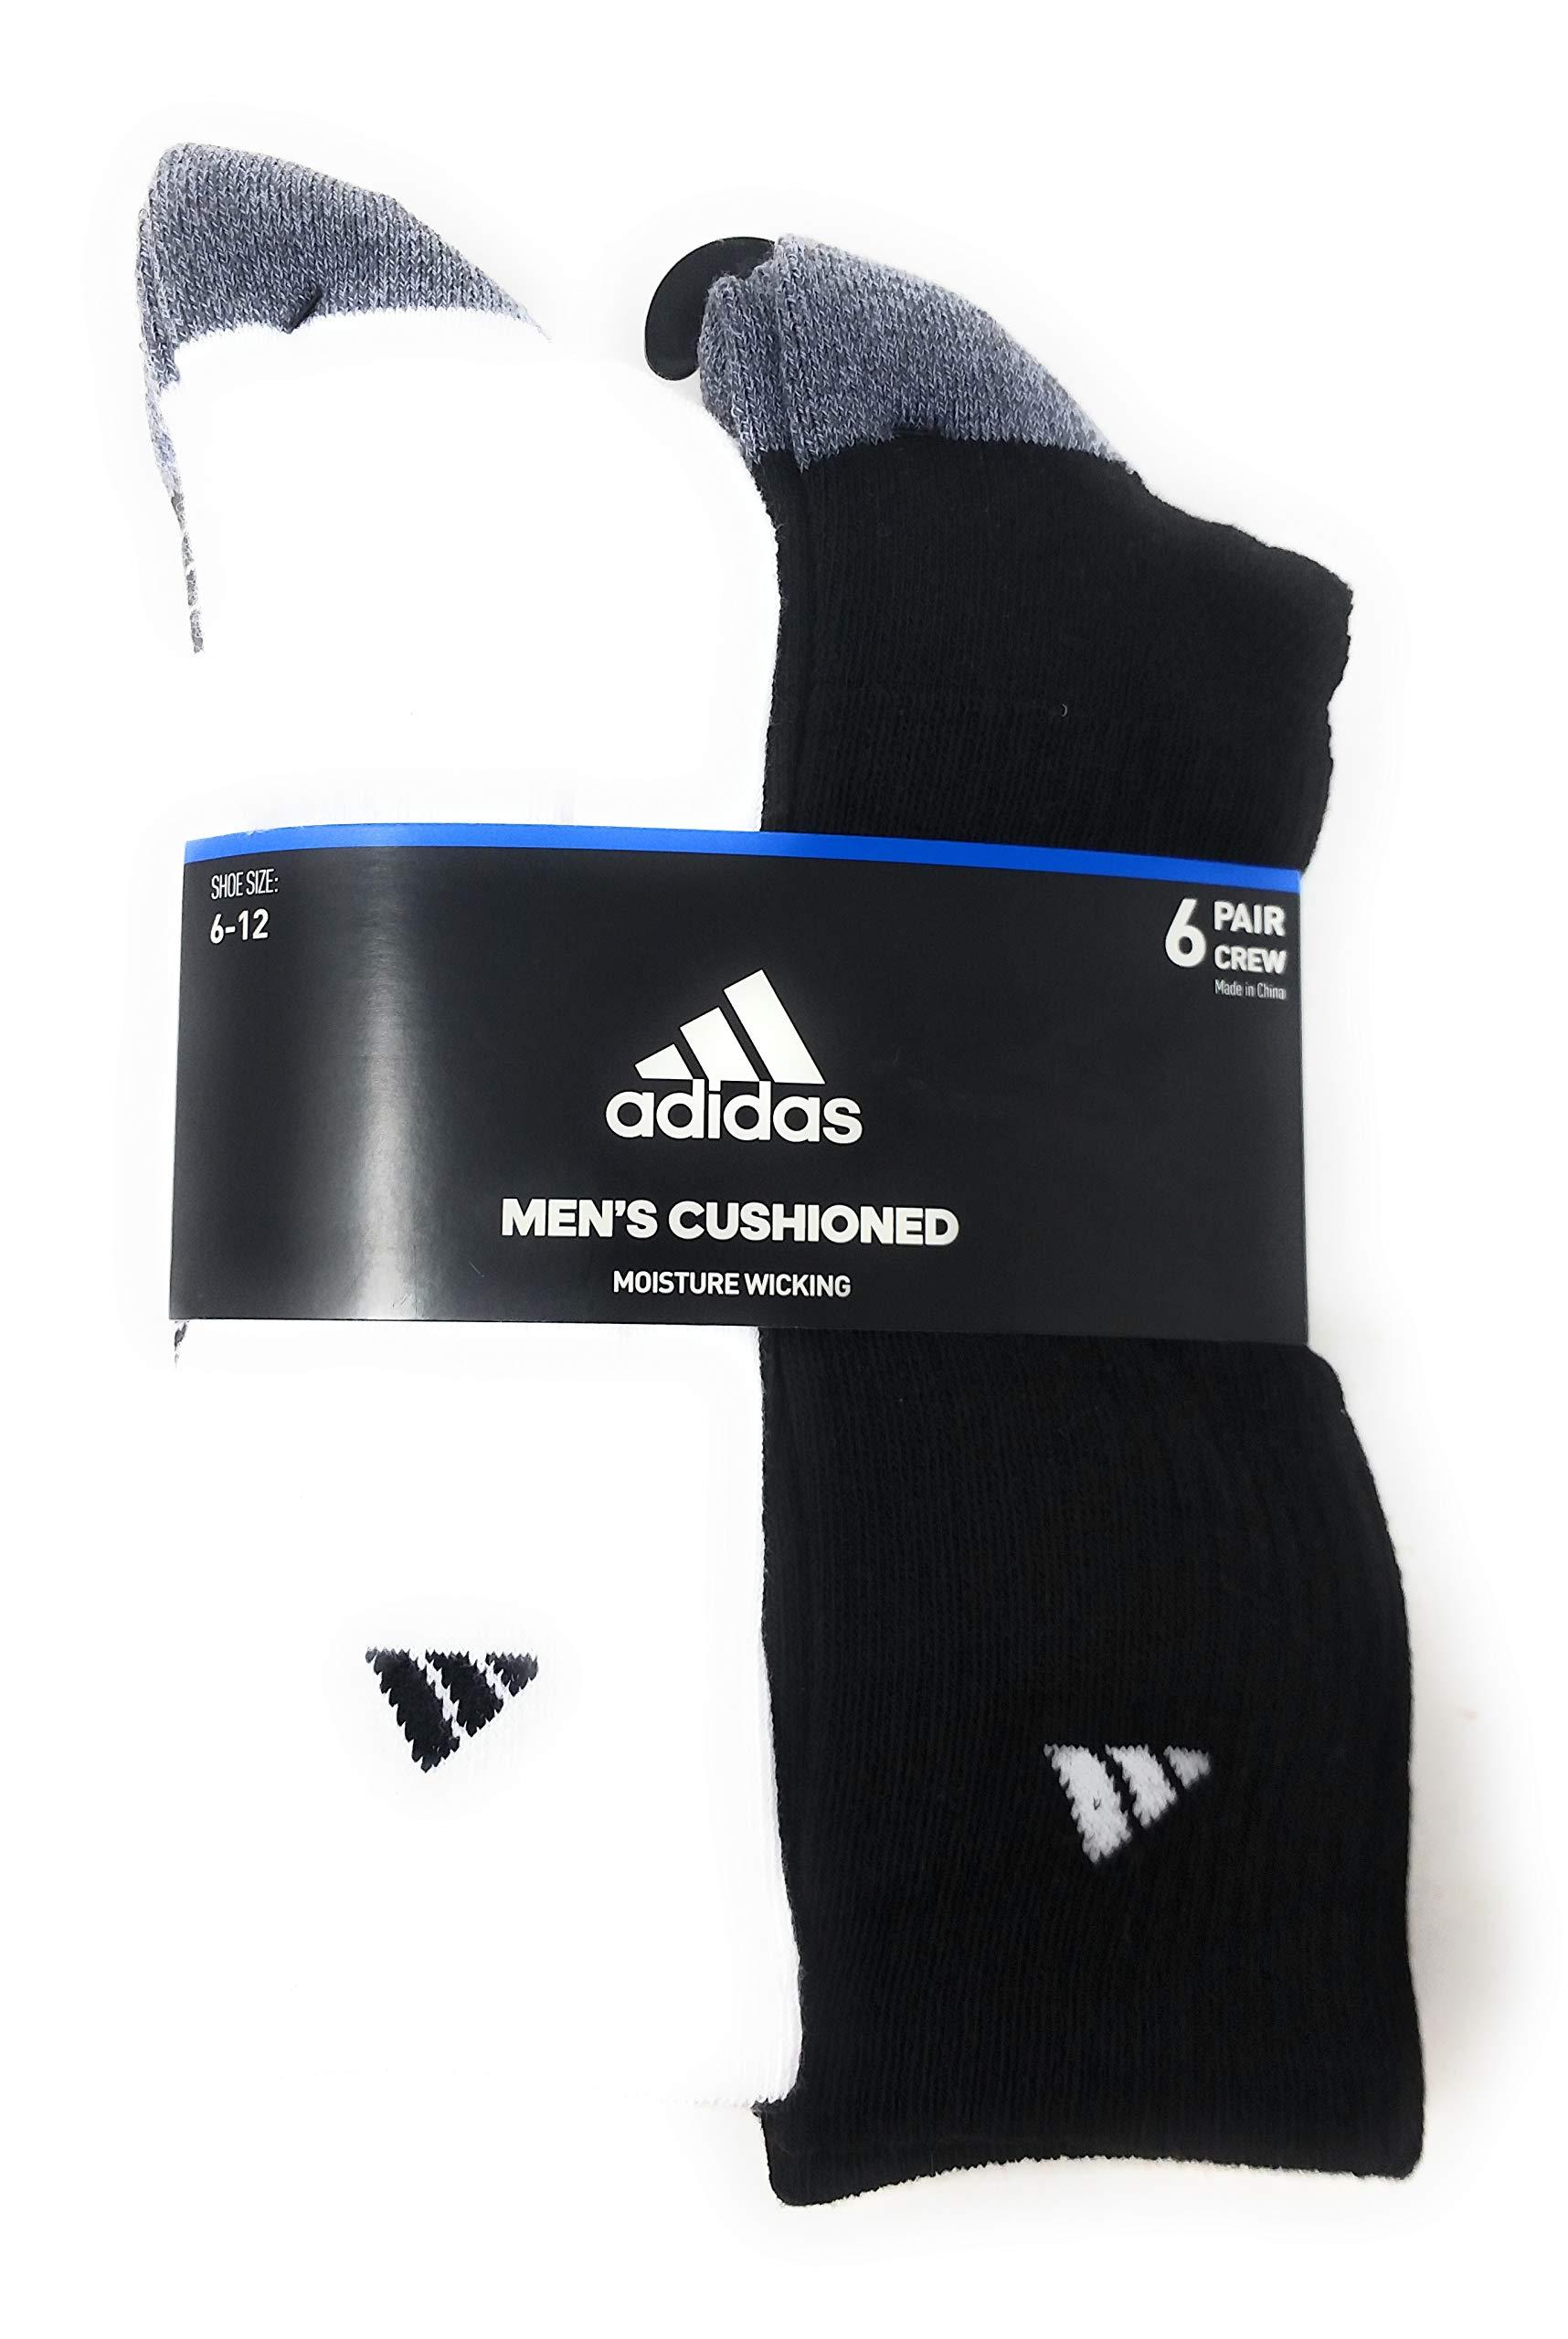 Adidas Mens Cushioned Crew Socks, Black/White, Sizes 6-12, 6 Pair